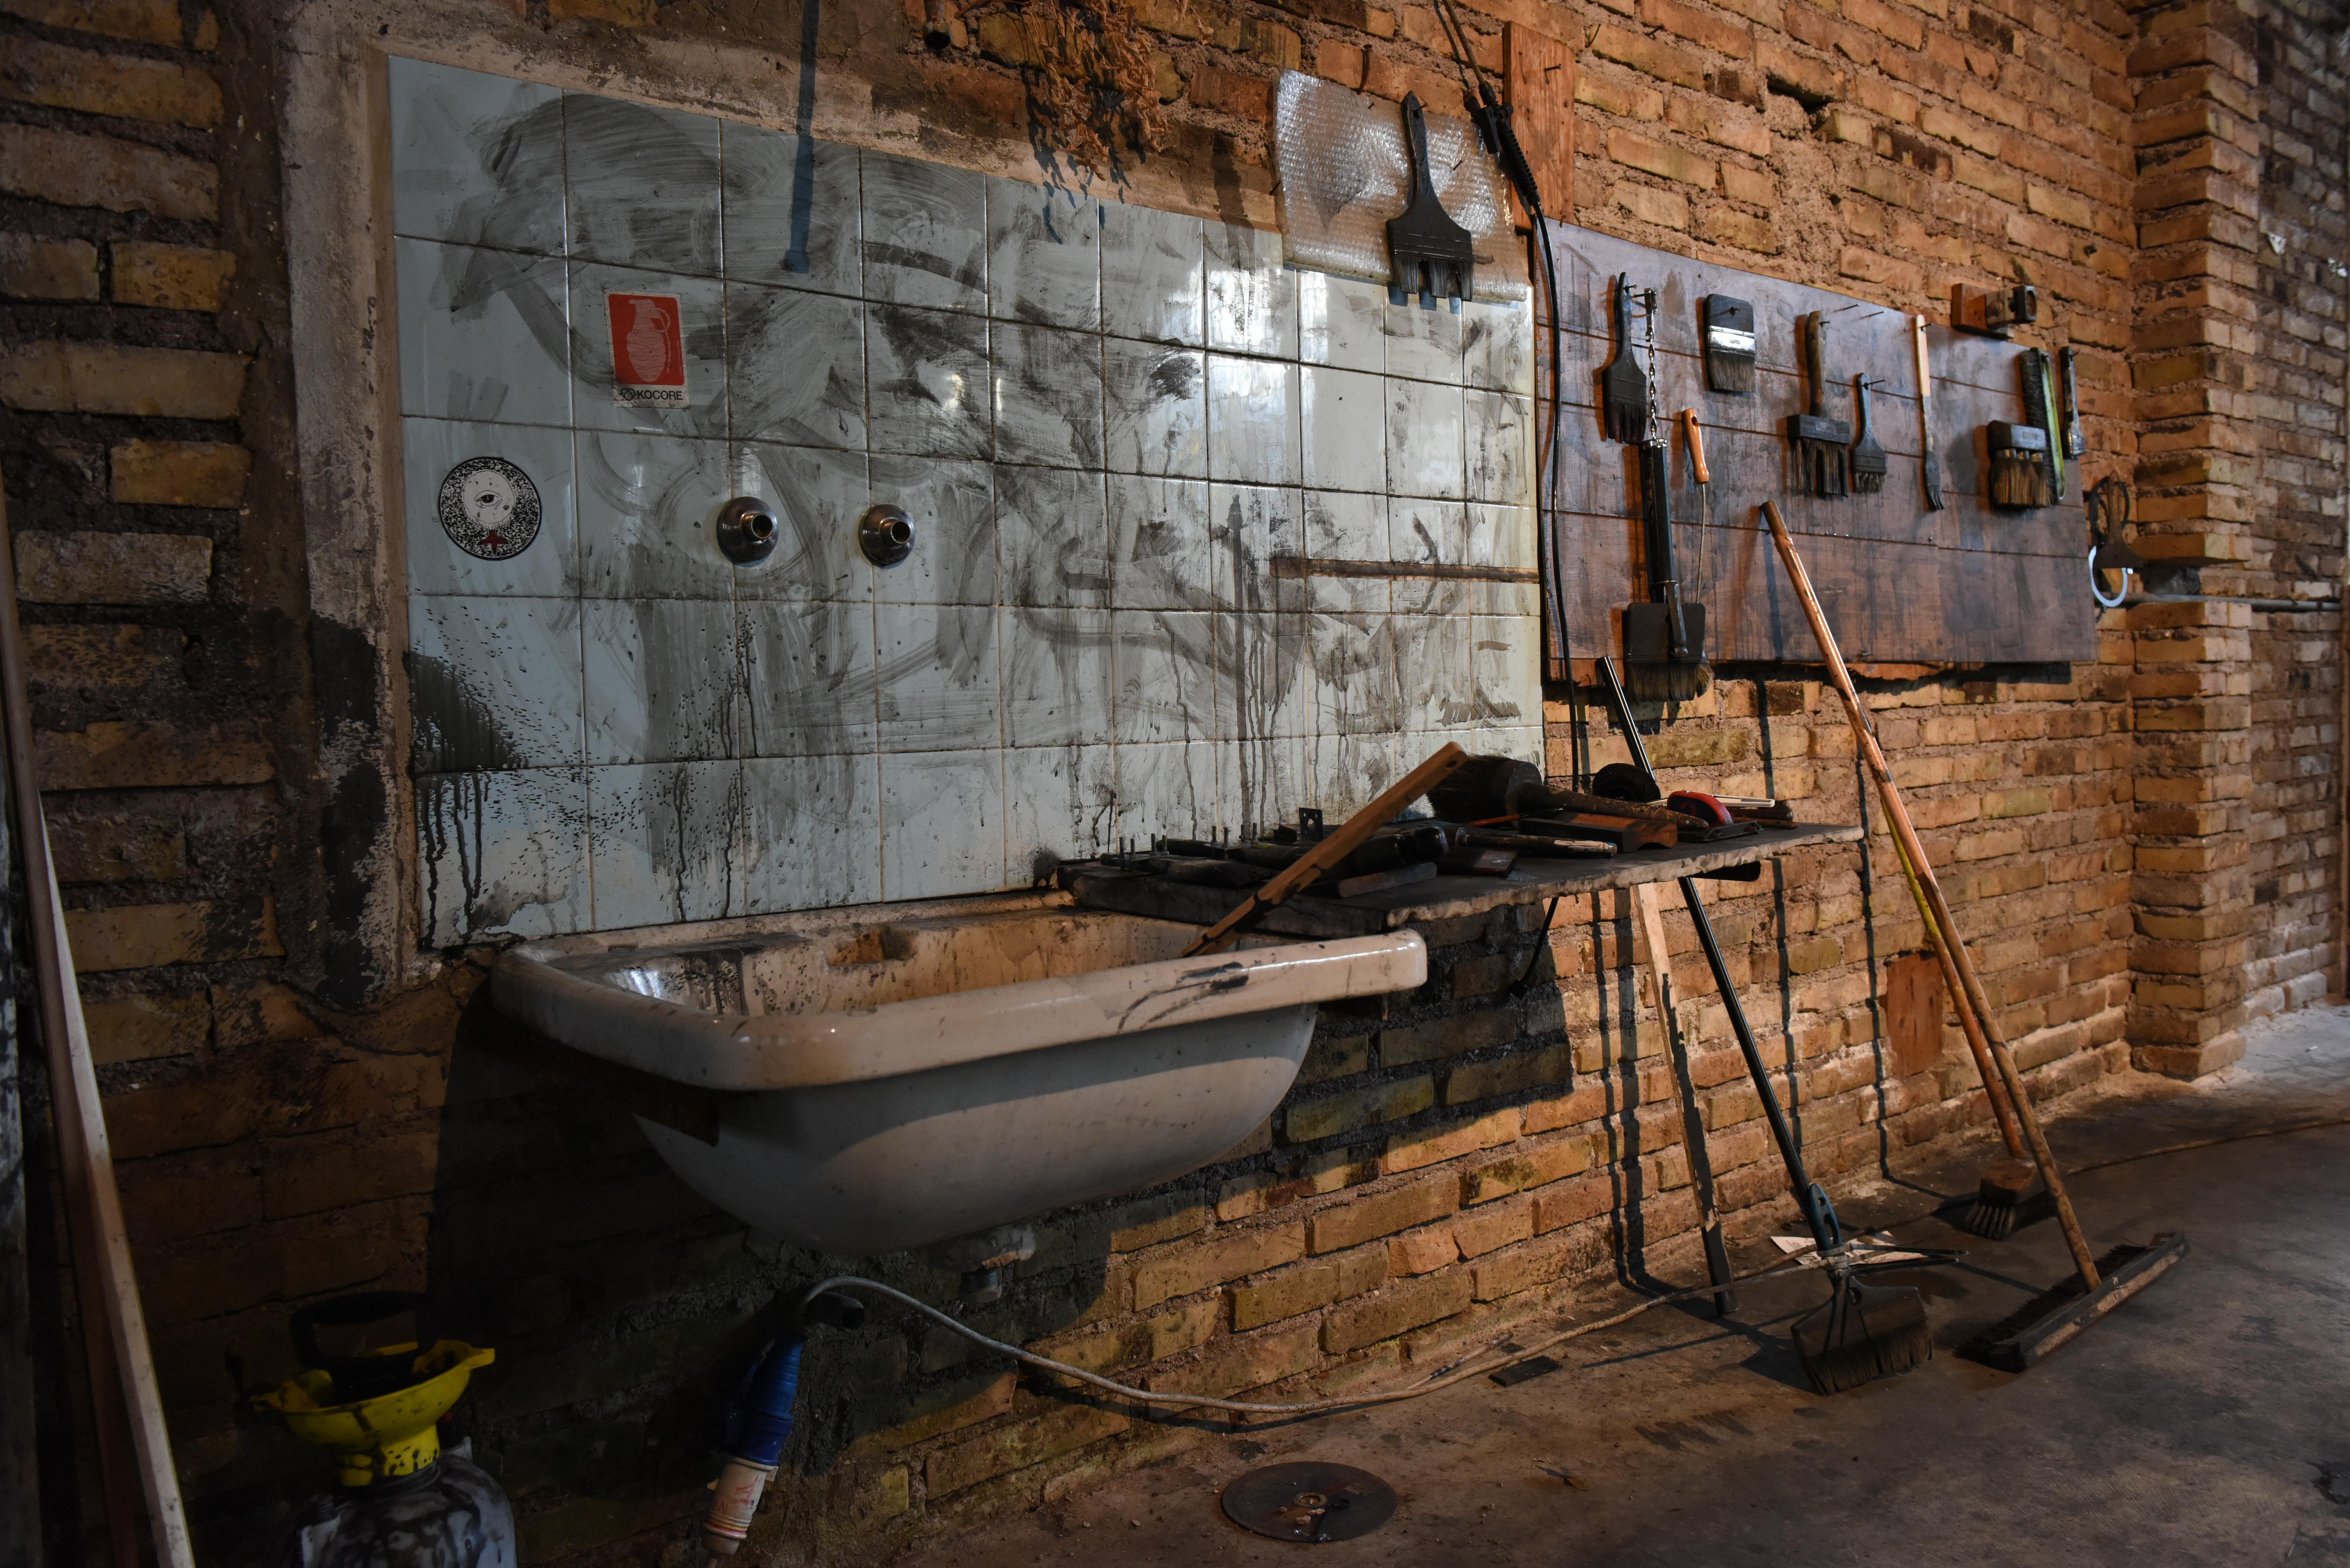 Kostenlose Foto Holz Mauer Werkstatt Fahrzeug Fabrik Kunst